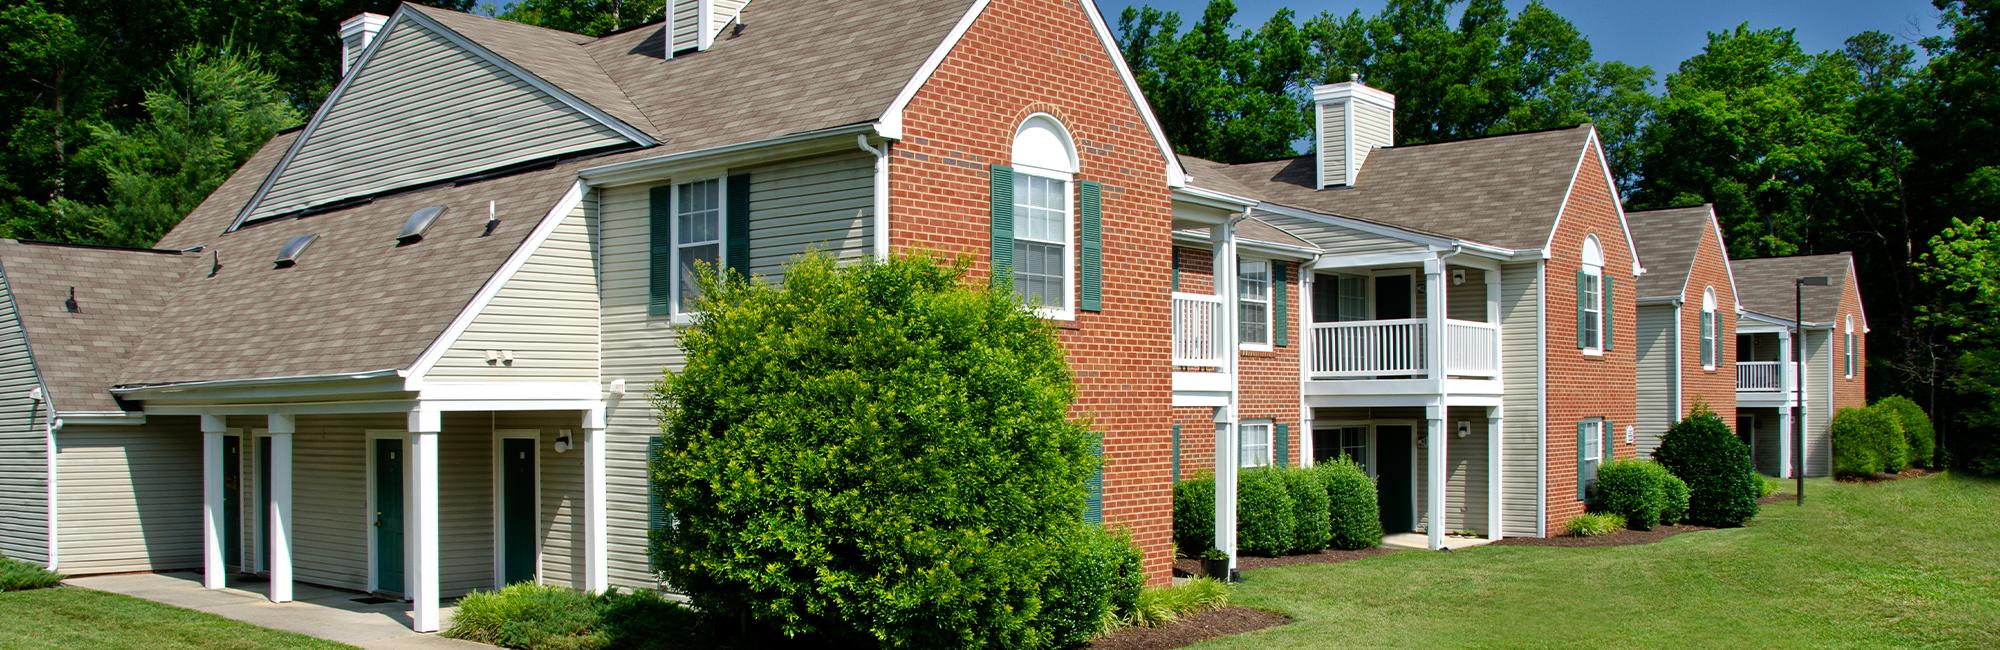 rockwood park apartments